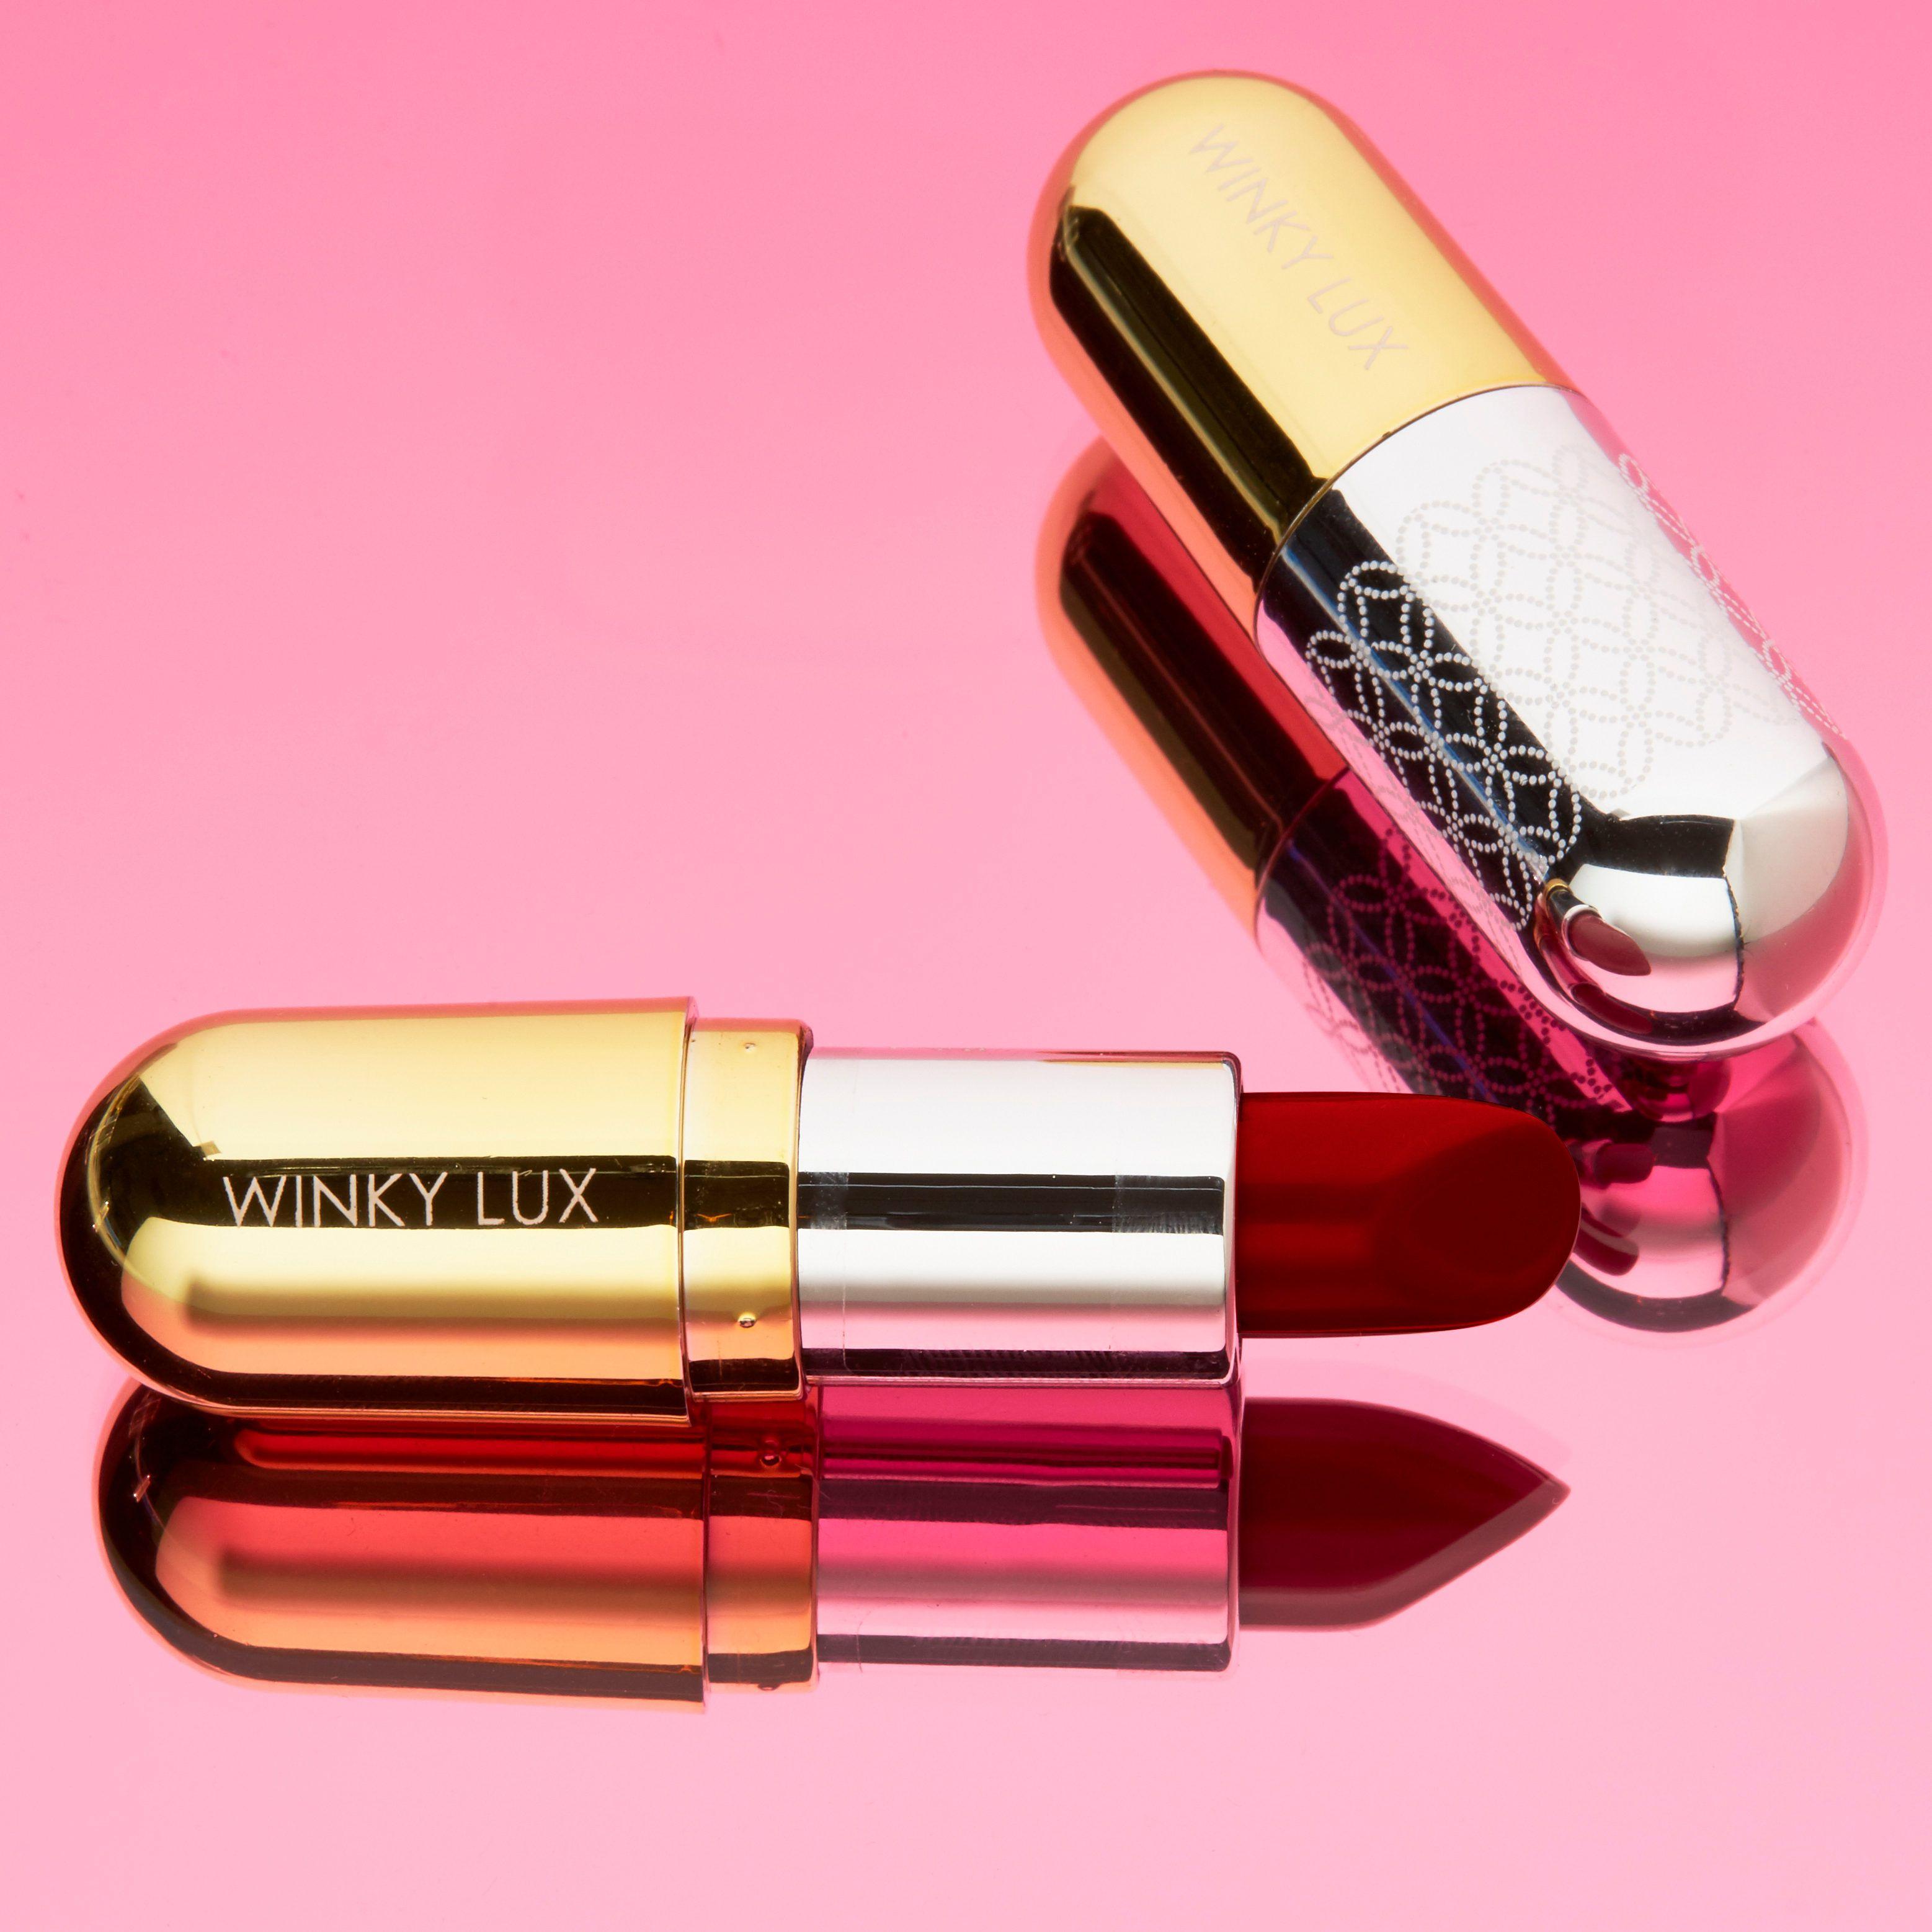 Pin on Makeup & Beauty